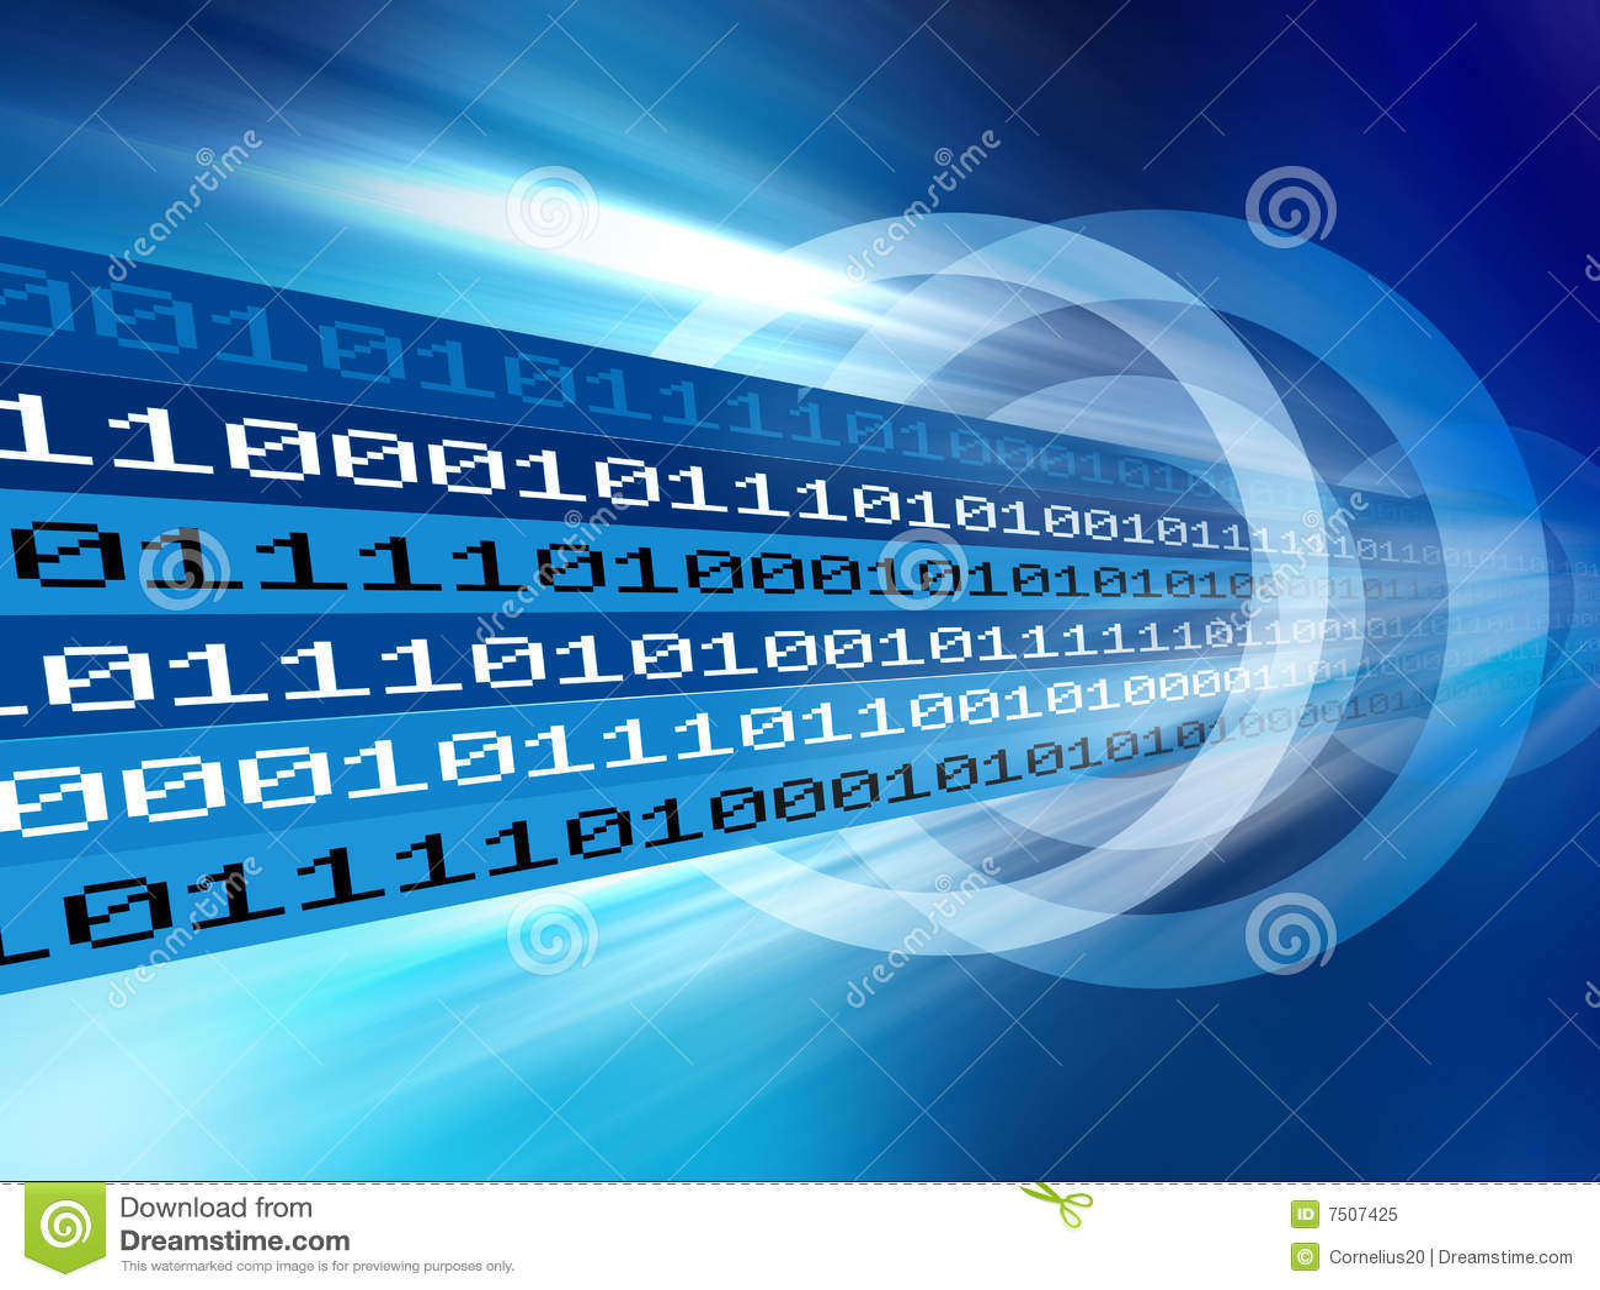 Data Transfer Royalty Free Stock Photo Image 7507425